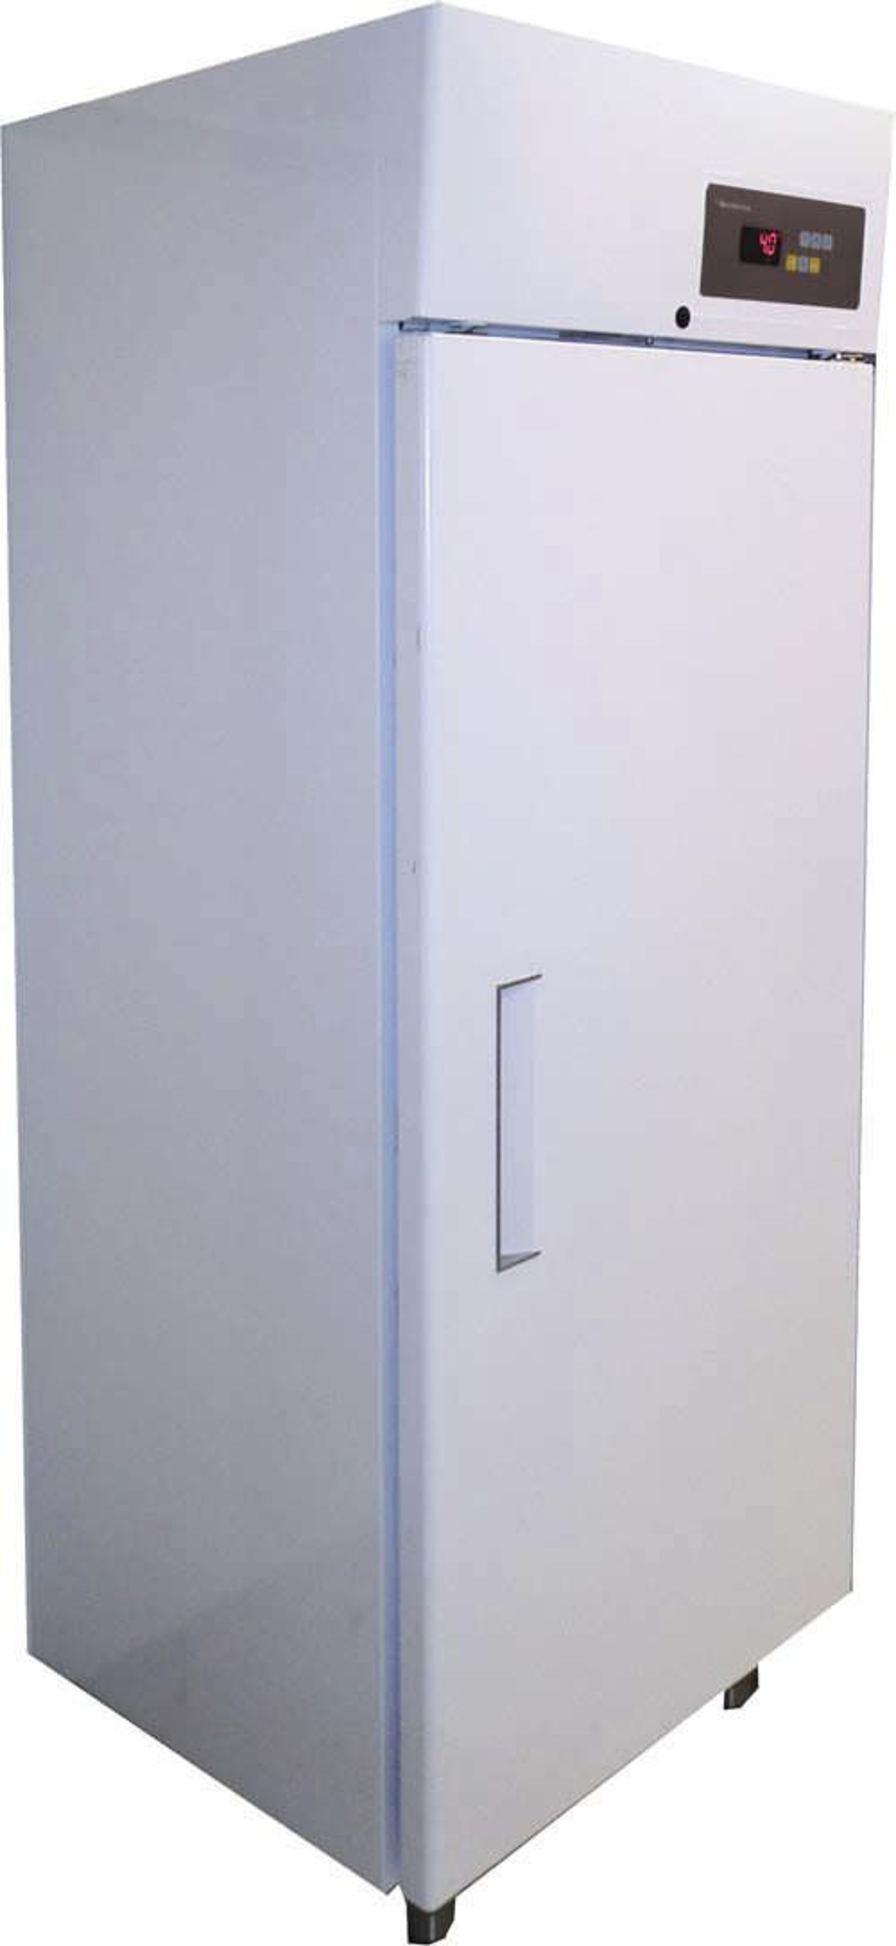 Laboratory freezer / cabinet / 1-door LF series IKS International